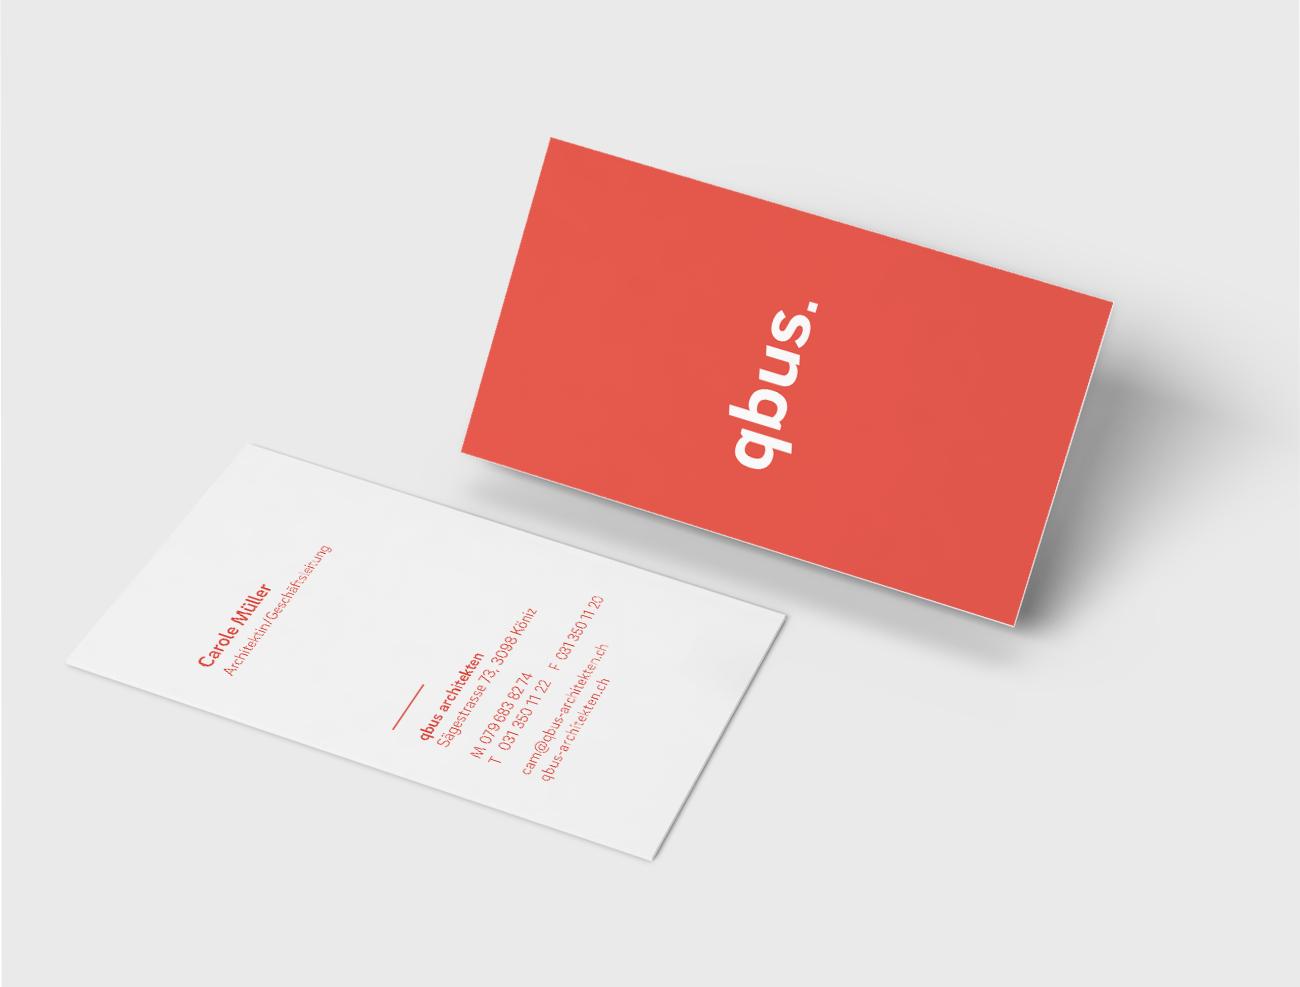 qbus Architekten Branding Visitenkarte